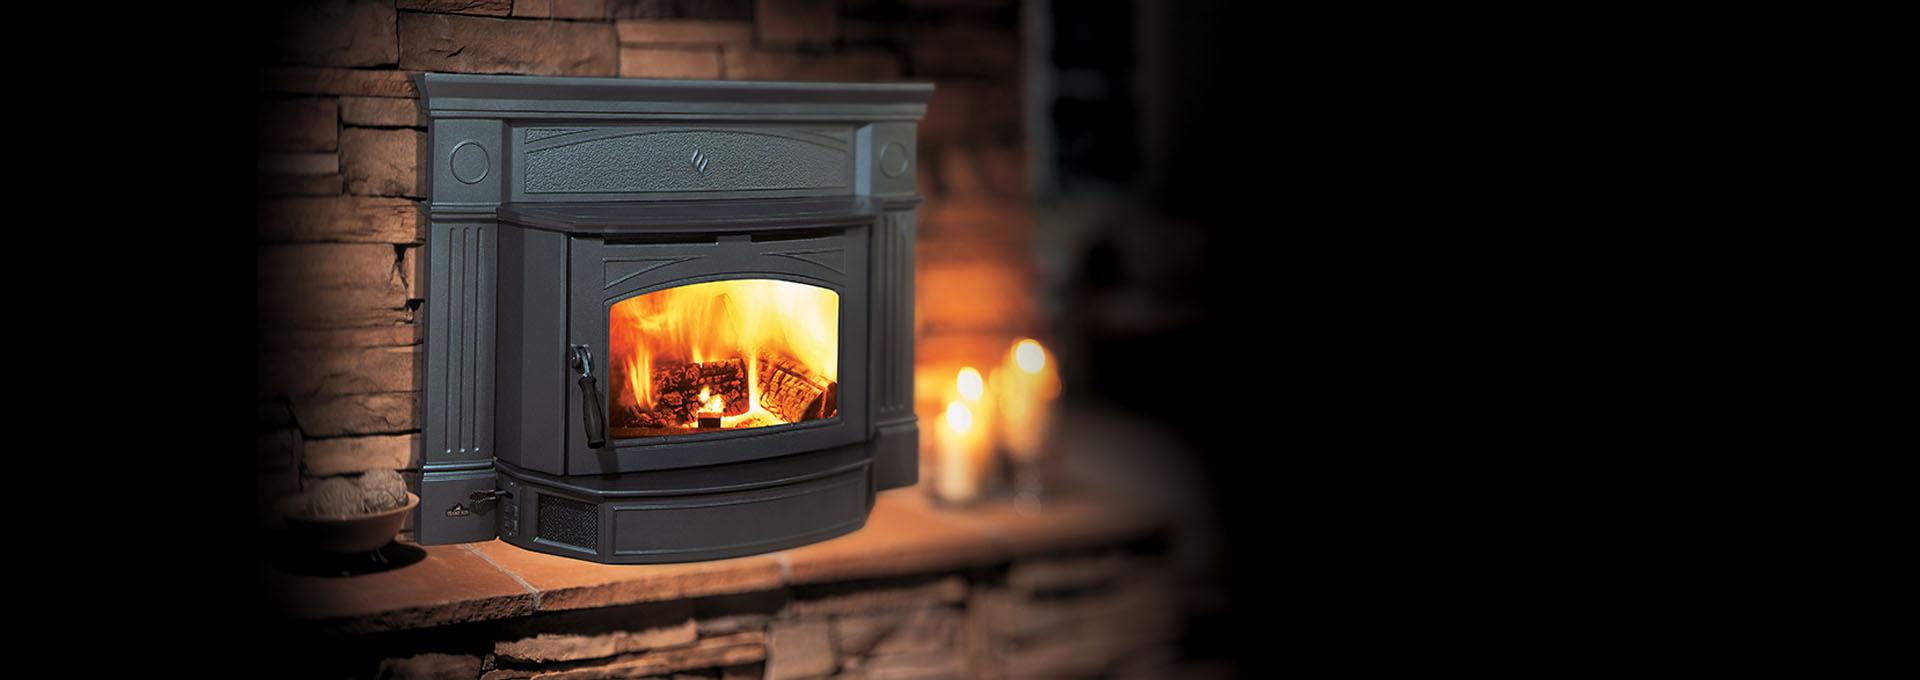 Timberline Fireplace Insert Manual Fireplaces